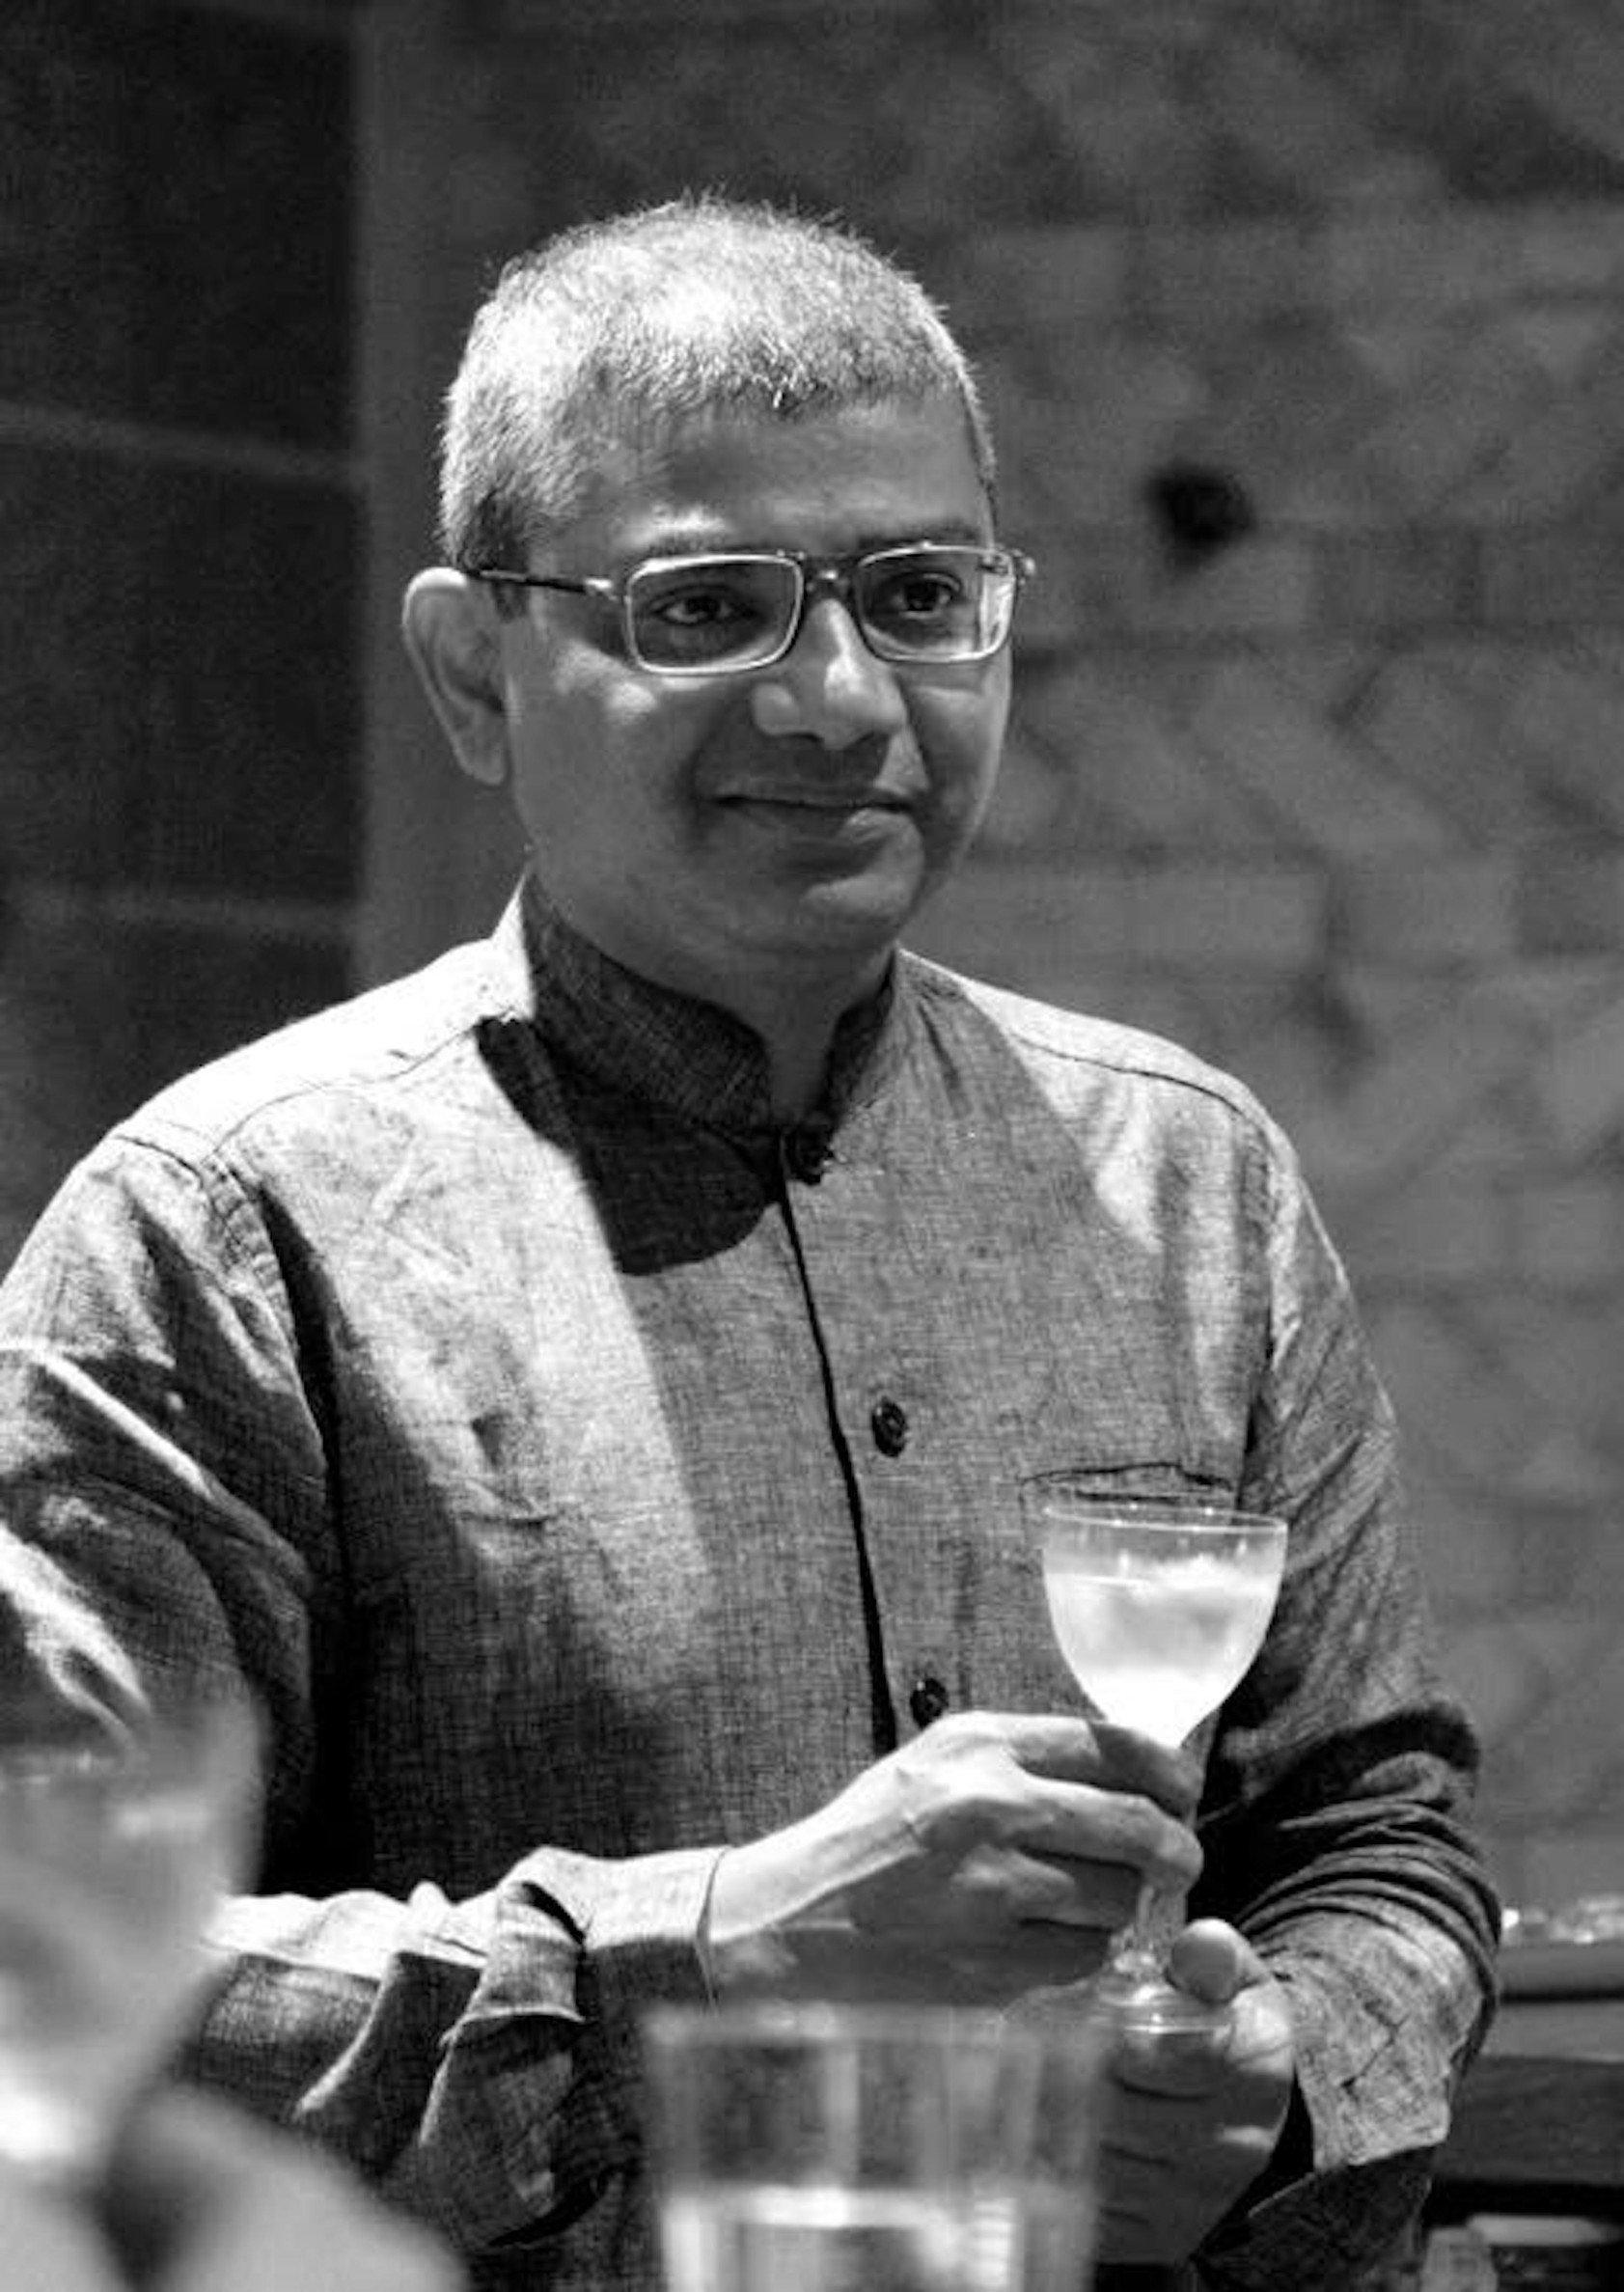 Beverage enthusiasts from Mumbai enjoy India's Luxury Beverage Festival 'The Vault Biennale'